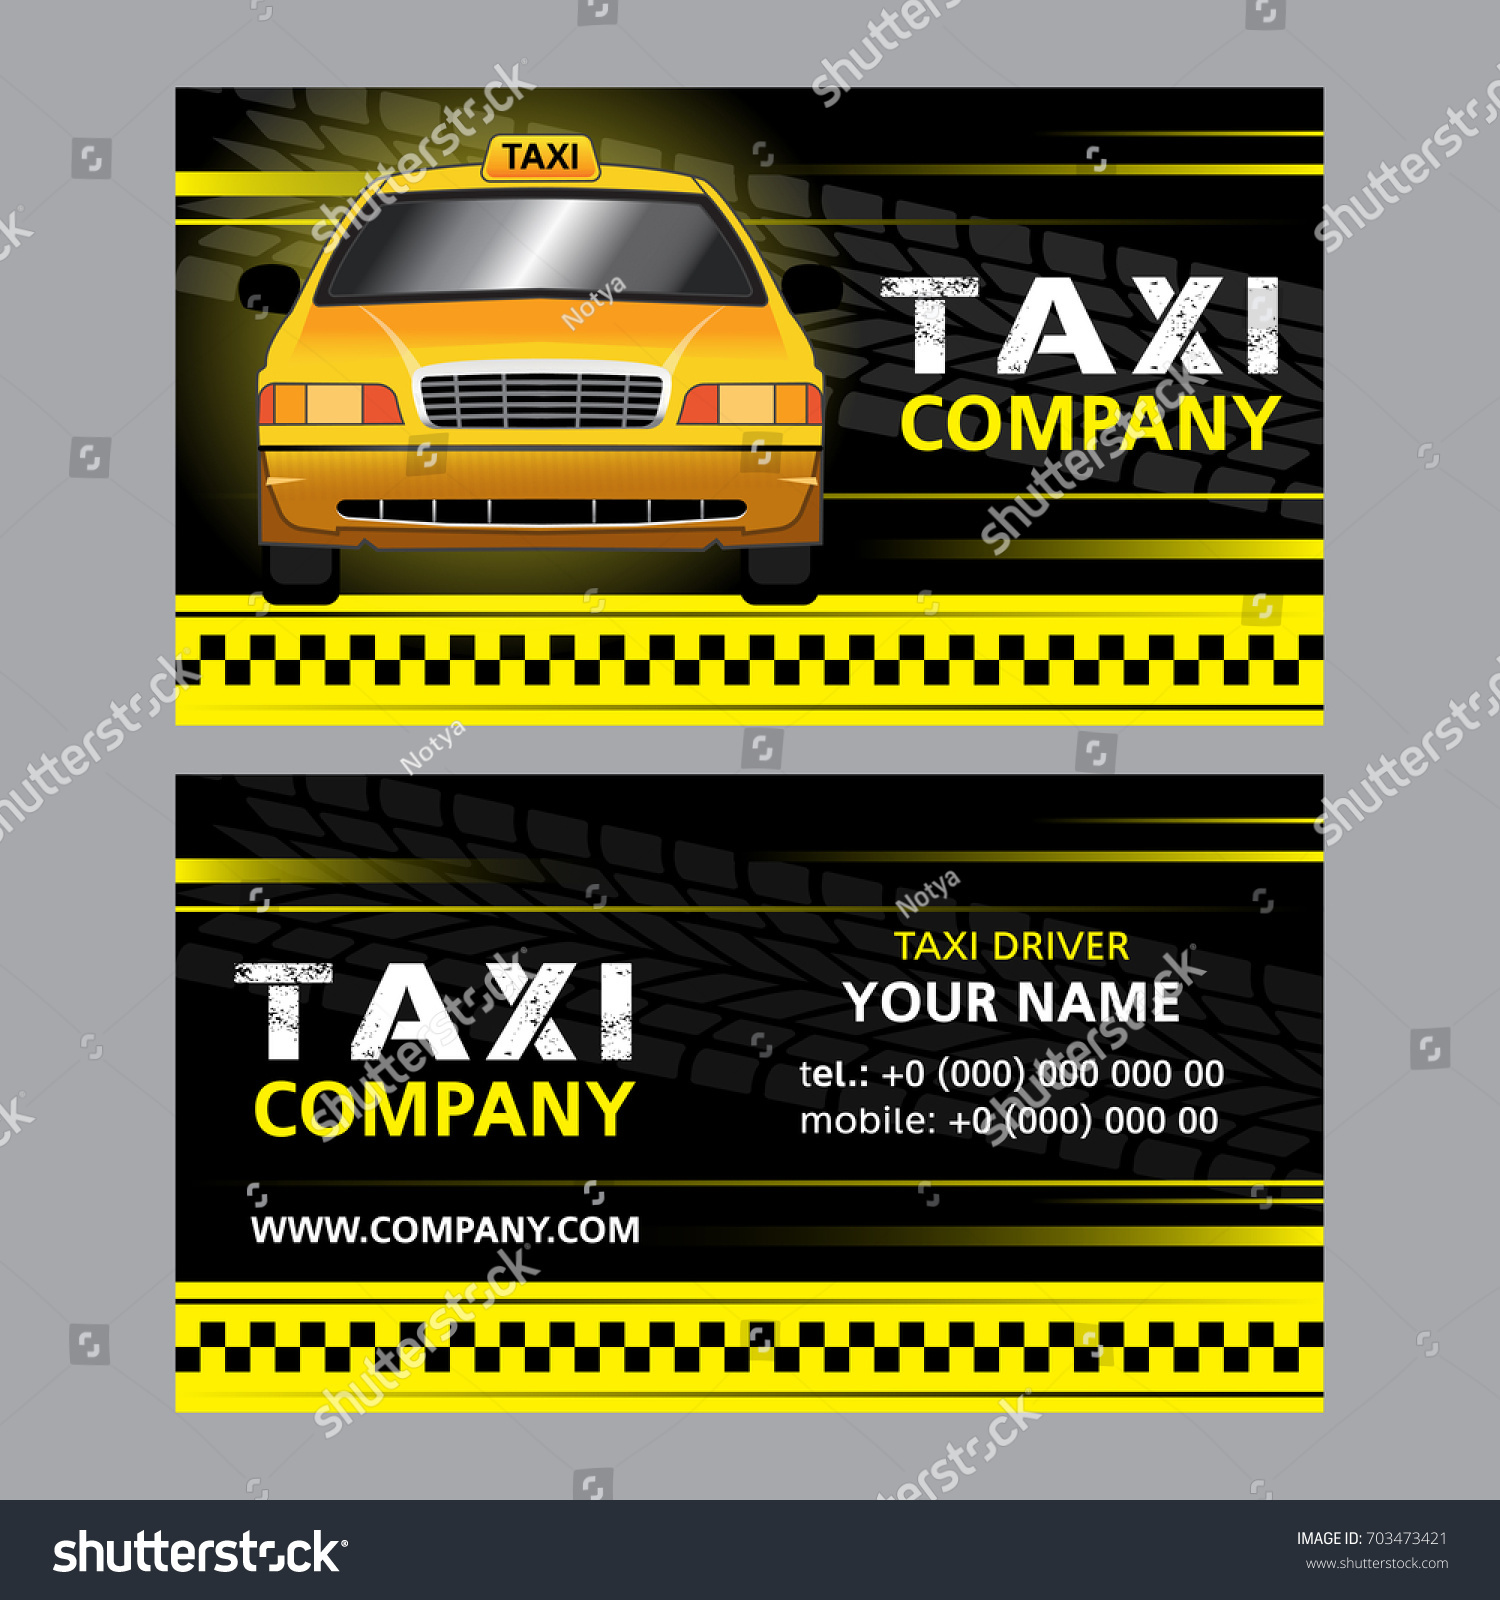 Taxi Business Card Yellow Taxi Cab Stock Photo (Photo, Vector ...